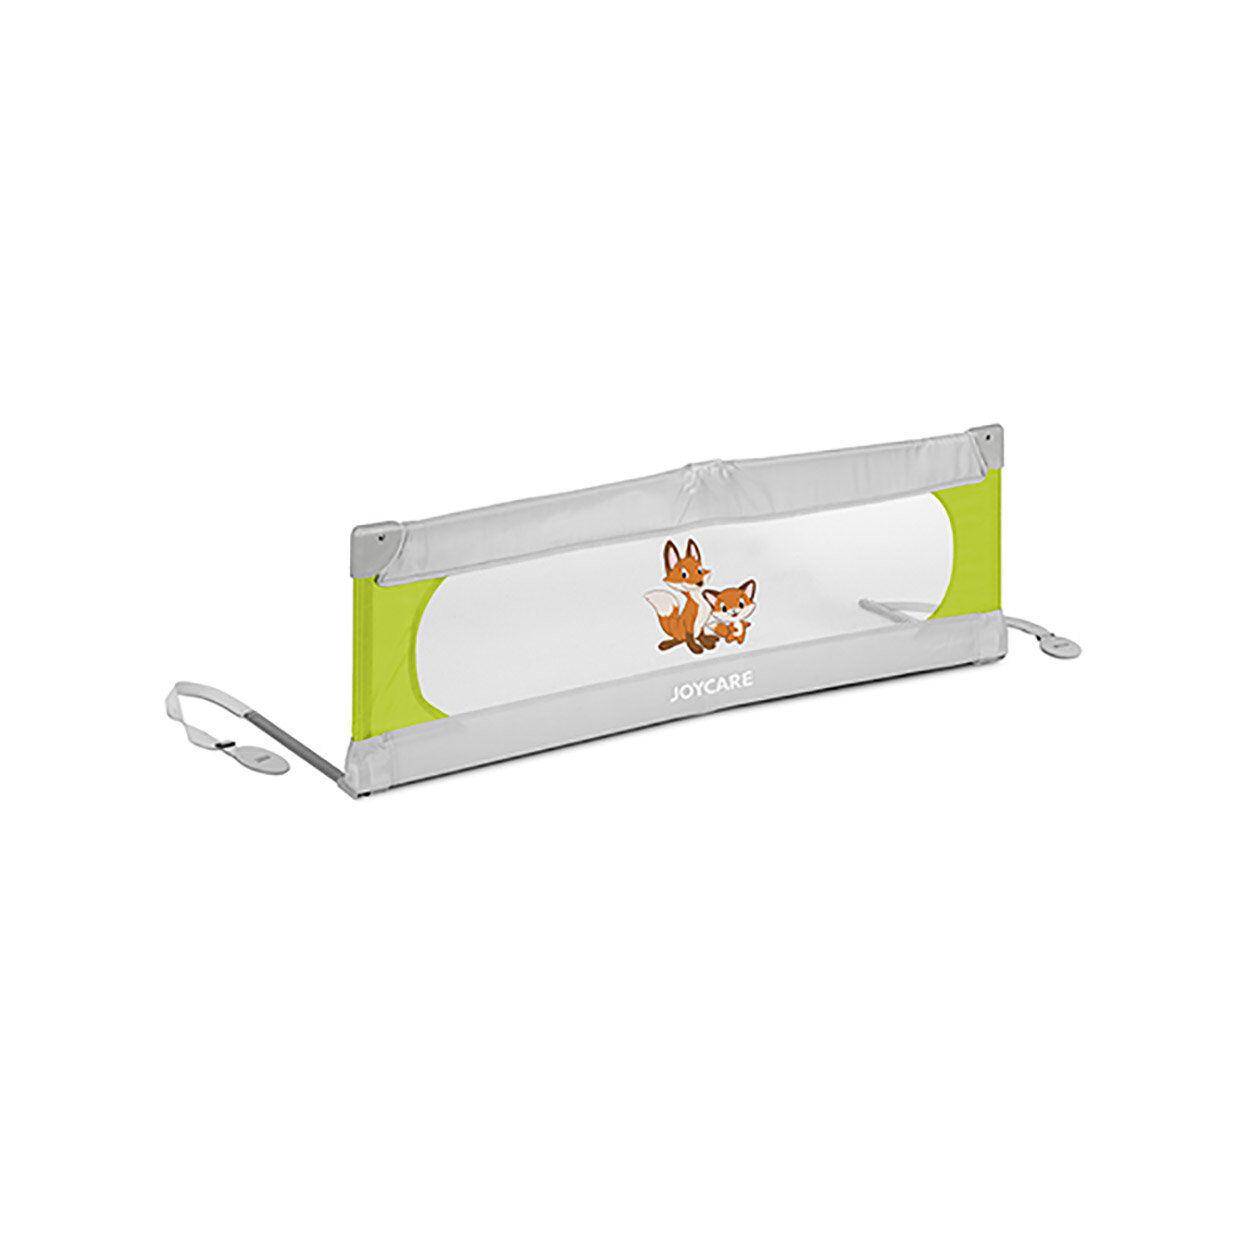 joycare bambino barriera letto 135 cm nuvola, verde lime/grigio